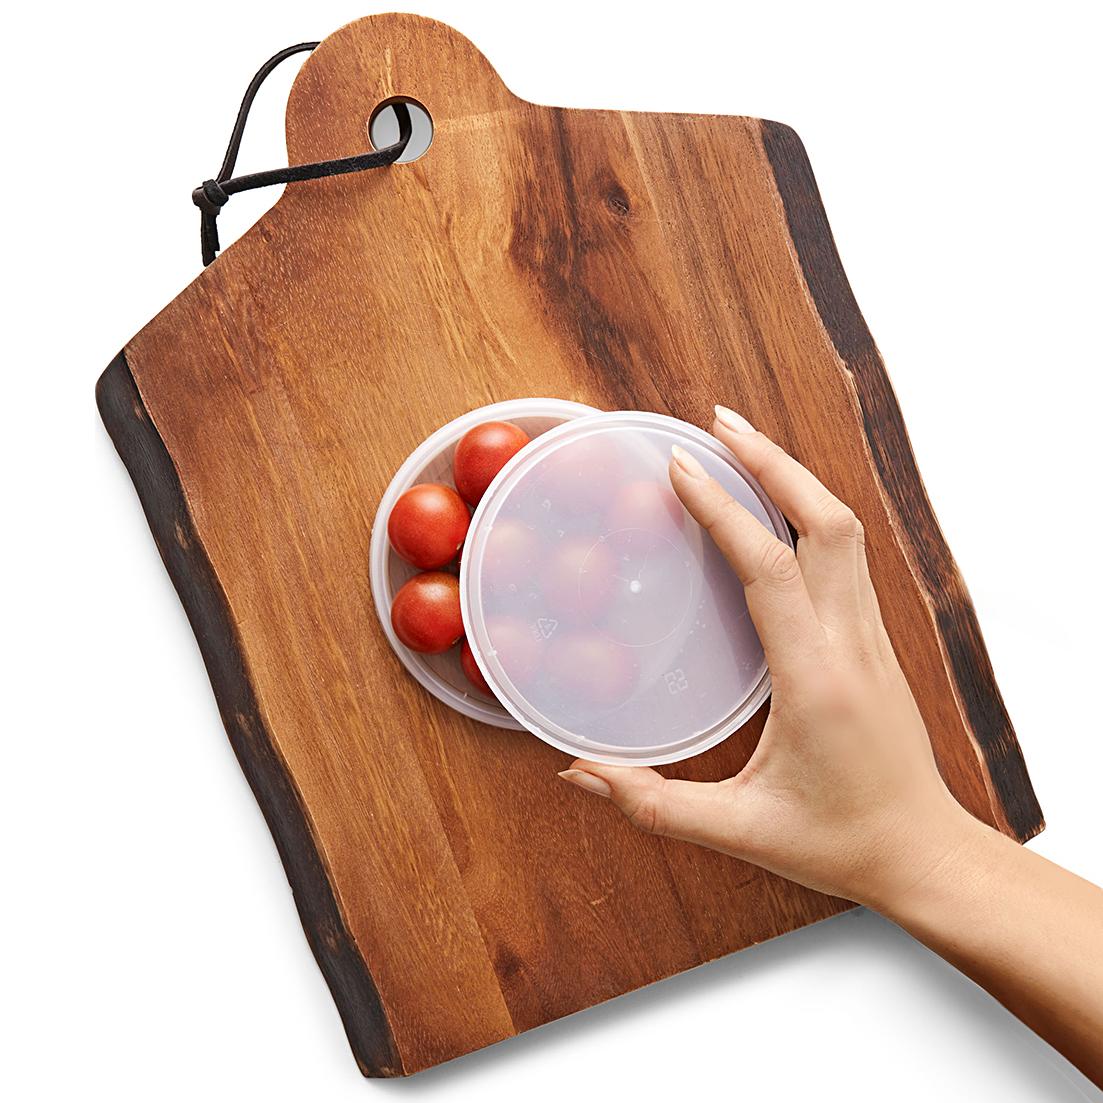 prep cutting cherry tomatoes hack